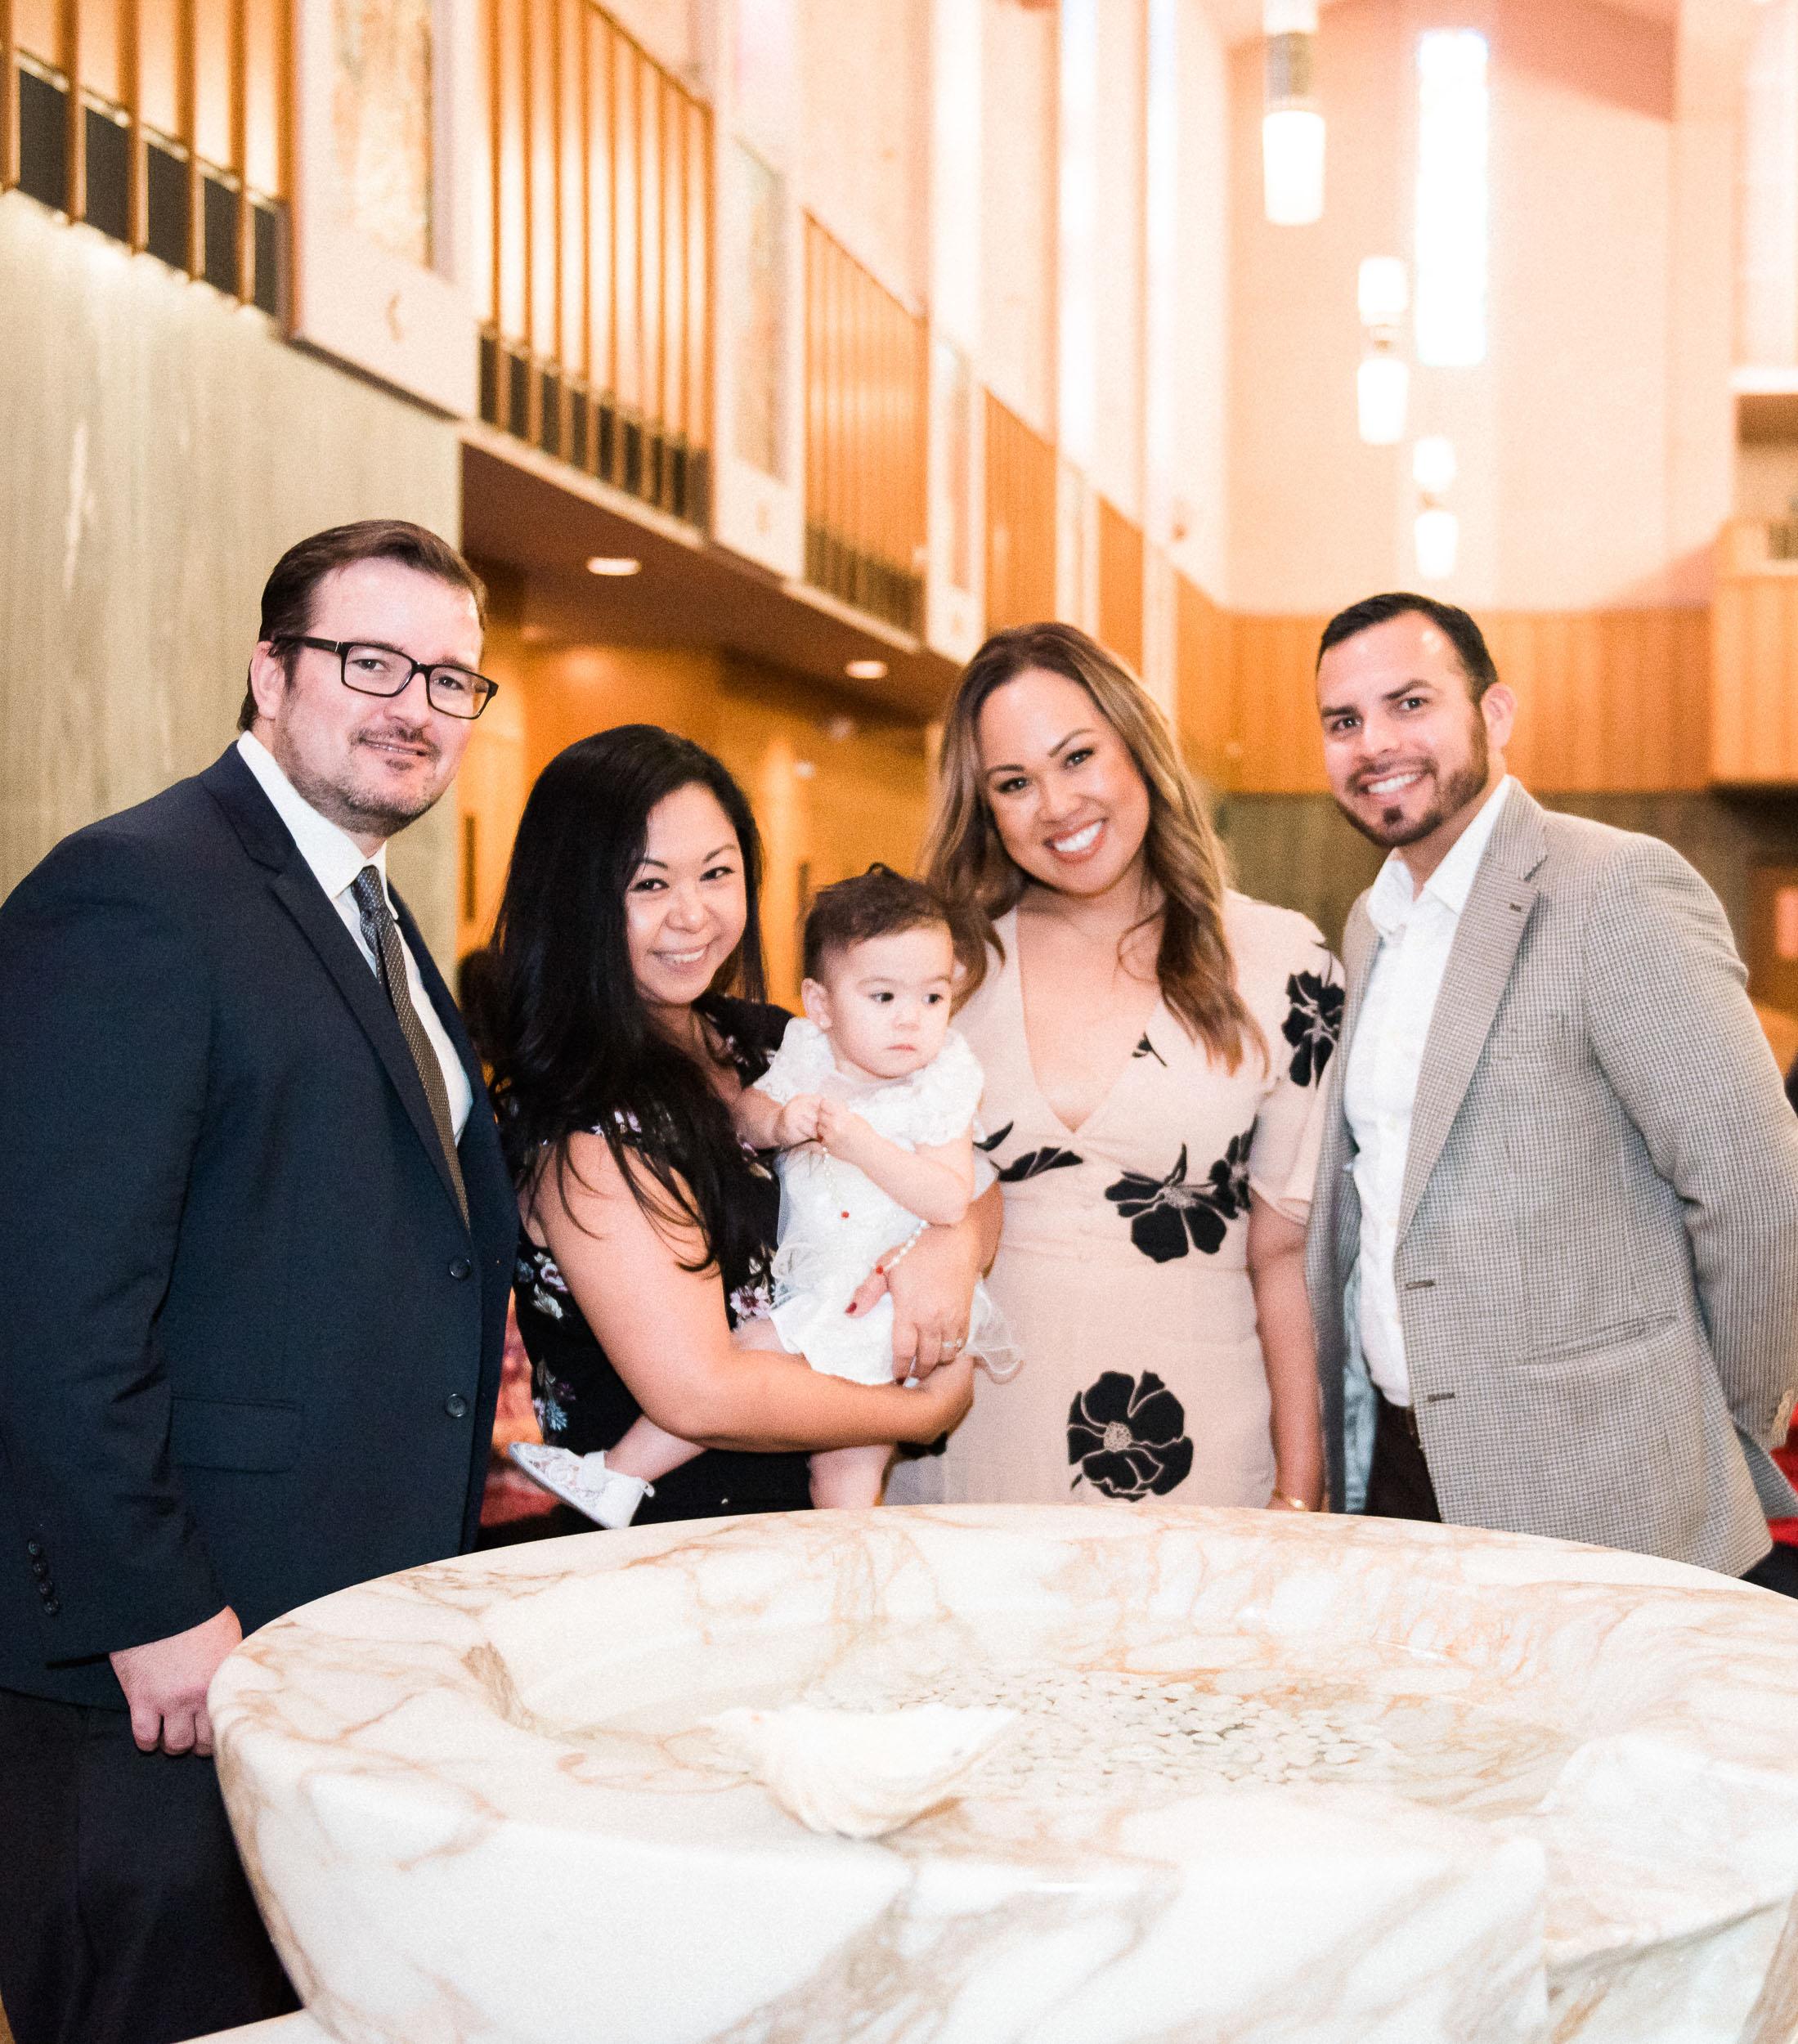 Bryan-Miraflor-Photo-Allison-Baptism-Church-20171014-0135.jpg